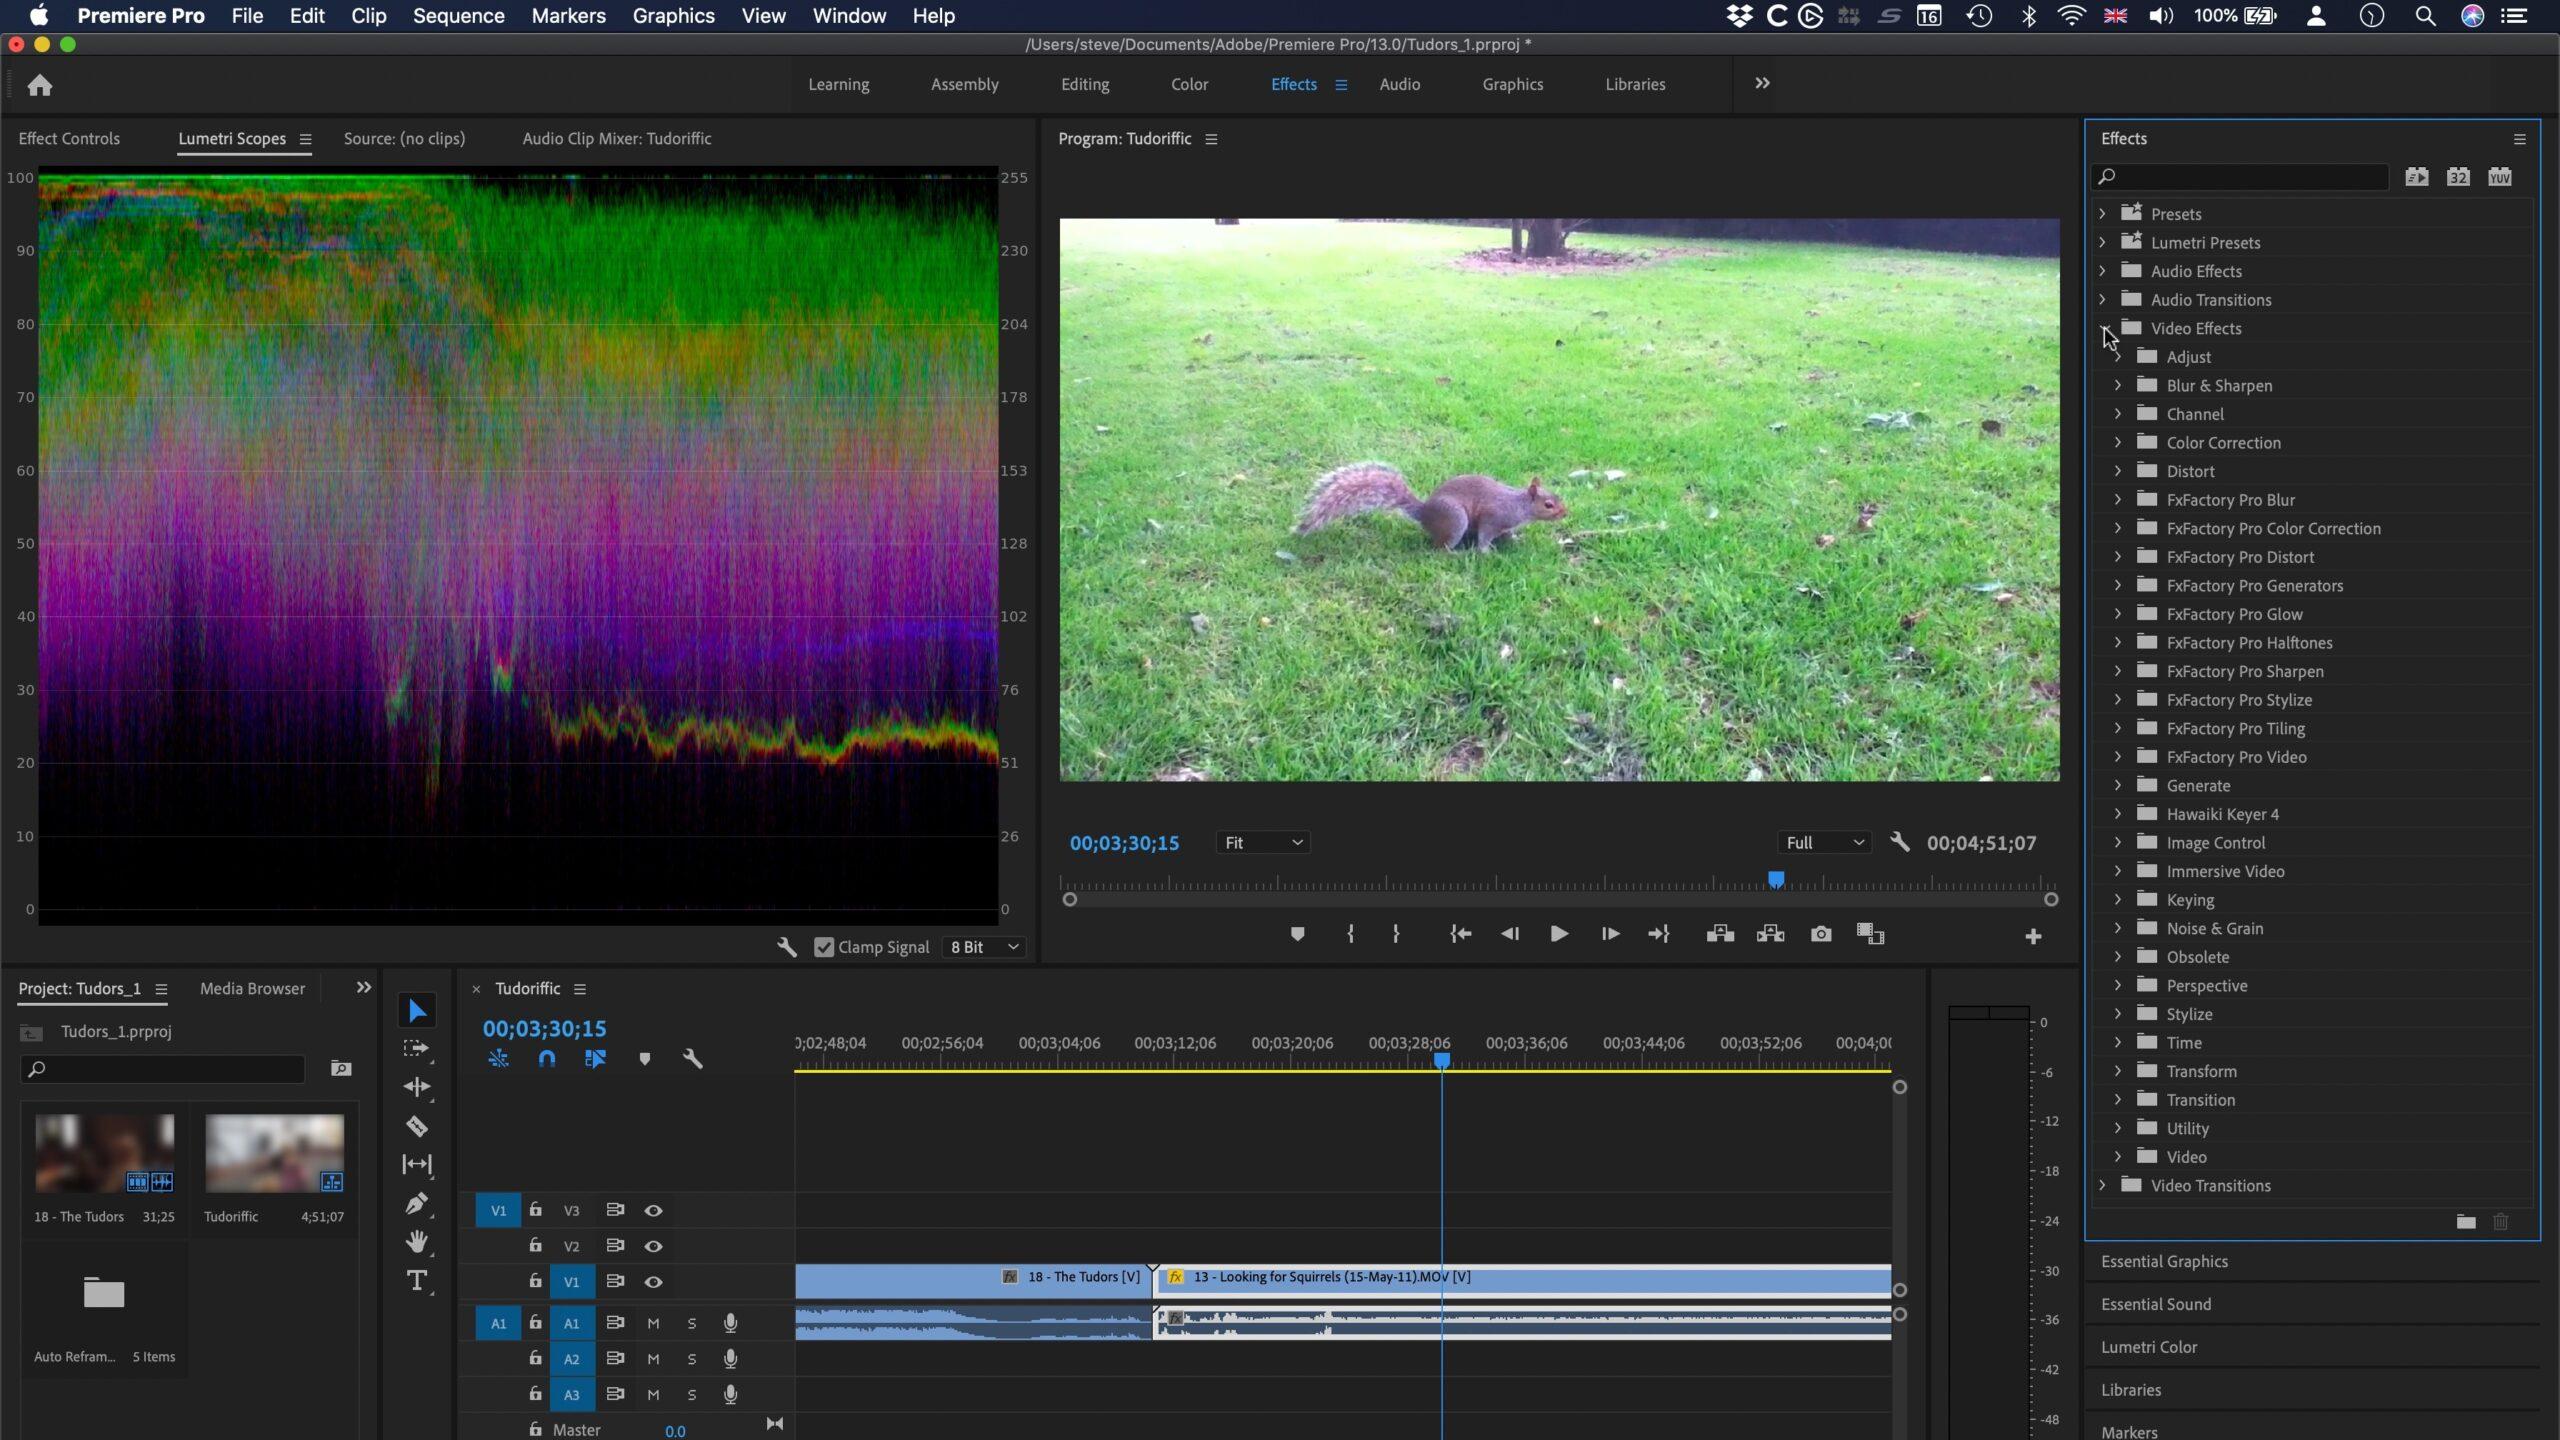 Adobe-Premiere-Pro-2020-for-Mac-Torrent